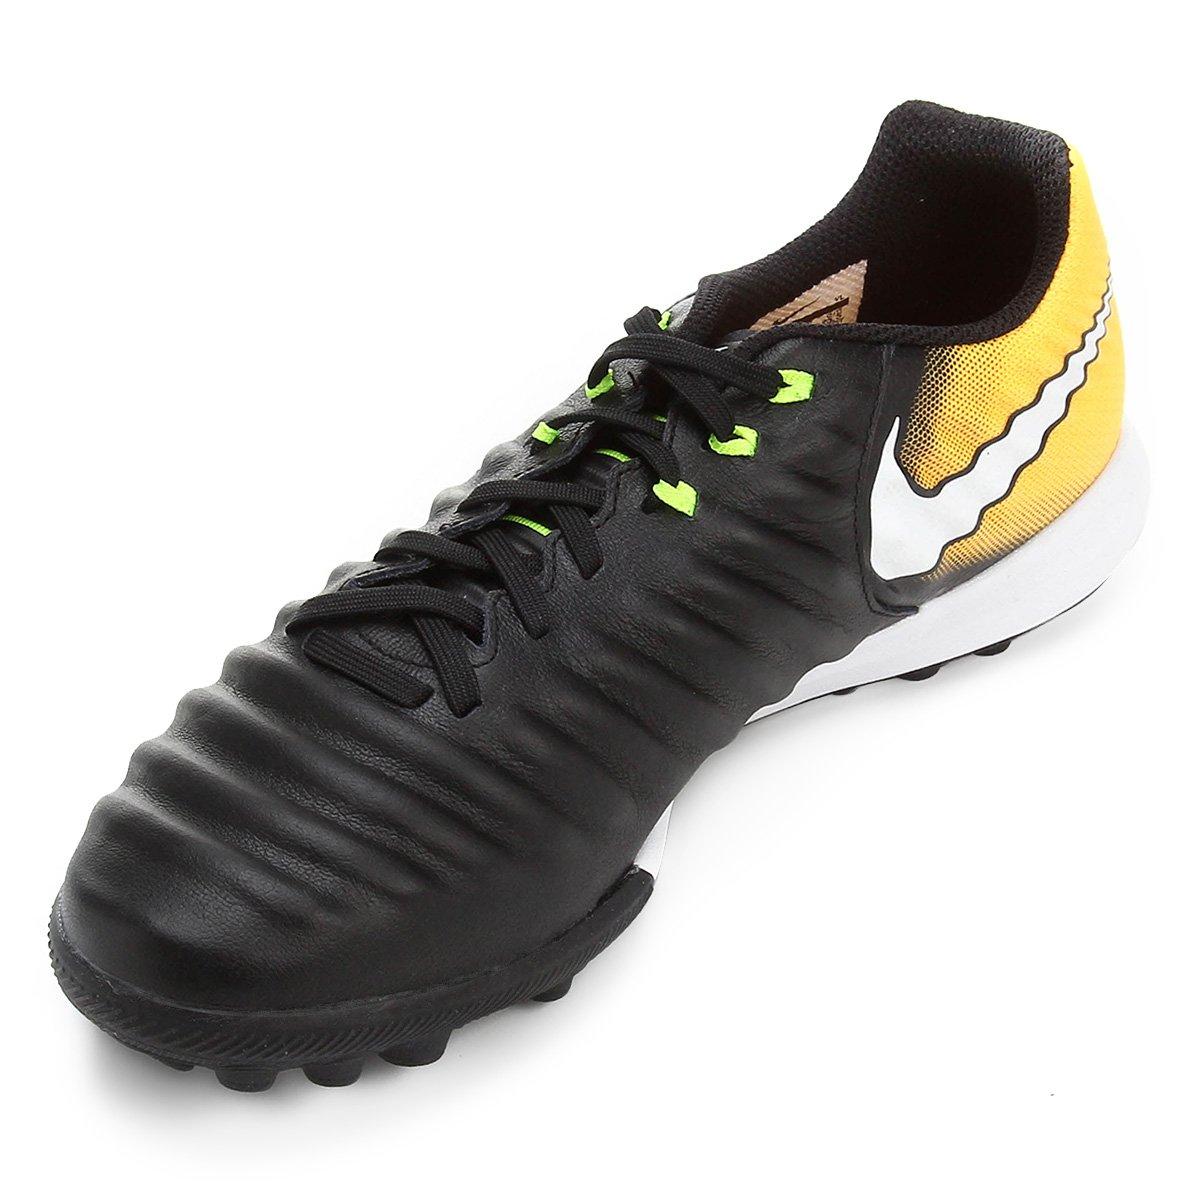 d32cac418a Chuteira Society Nike Tiempo Finale TF - Preto e Laranja - Compre ...